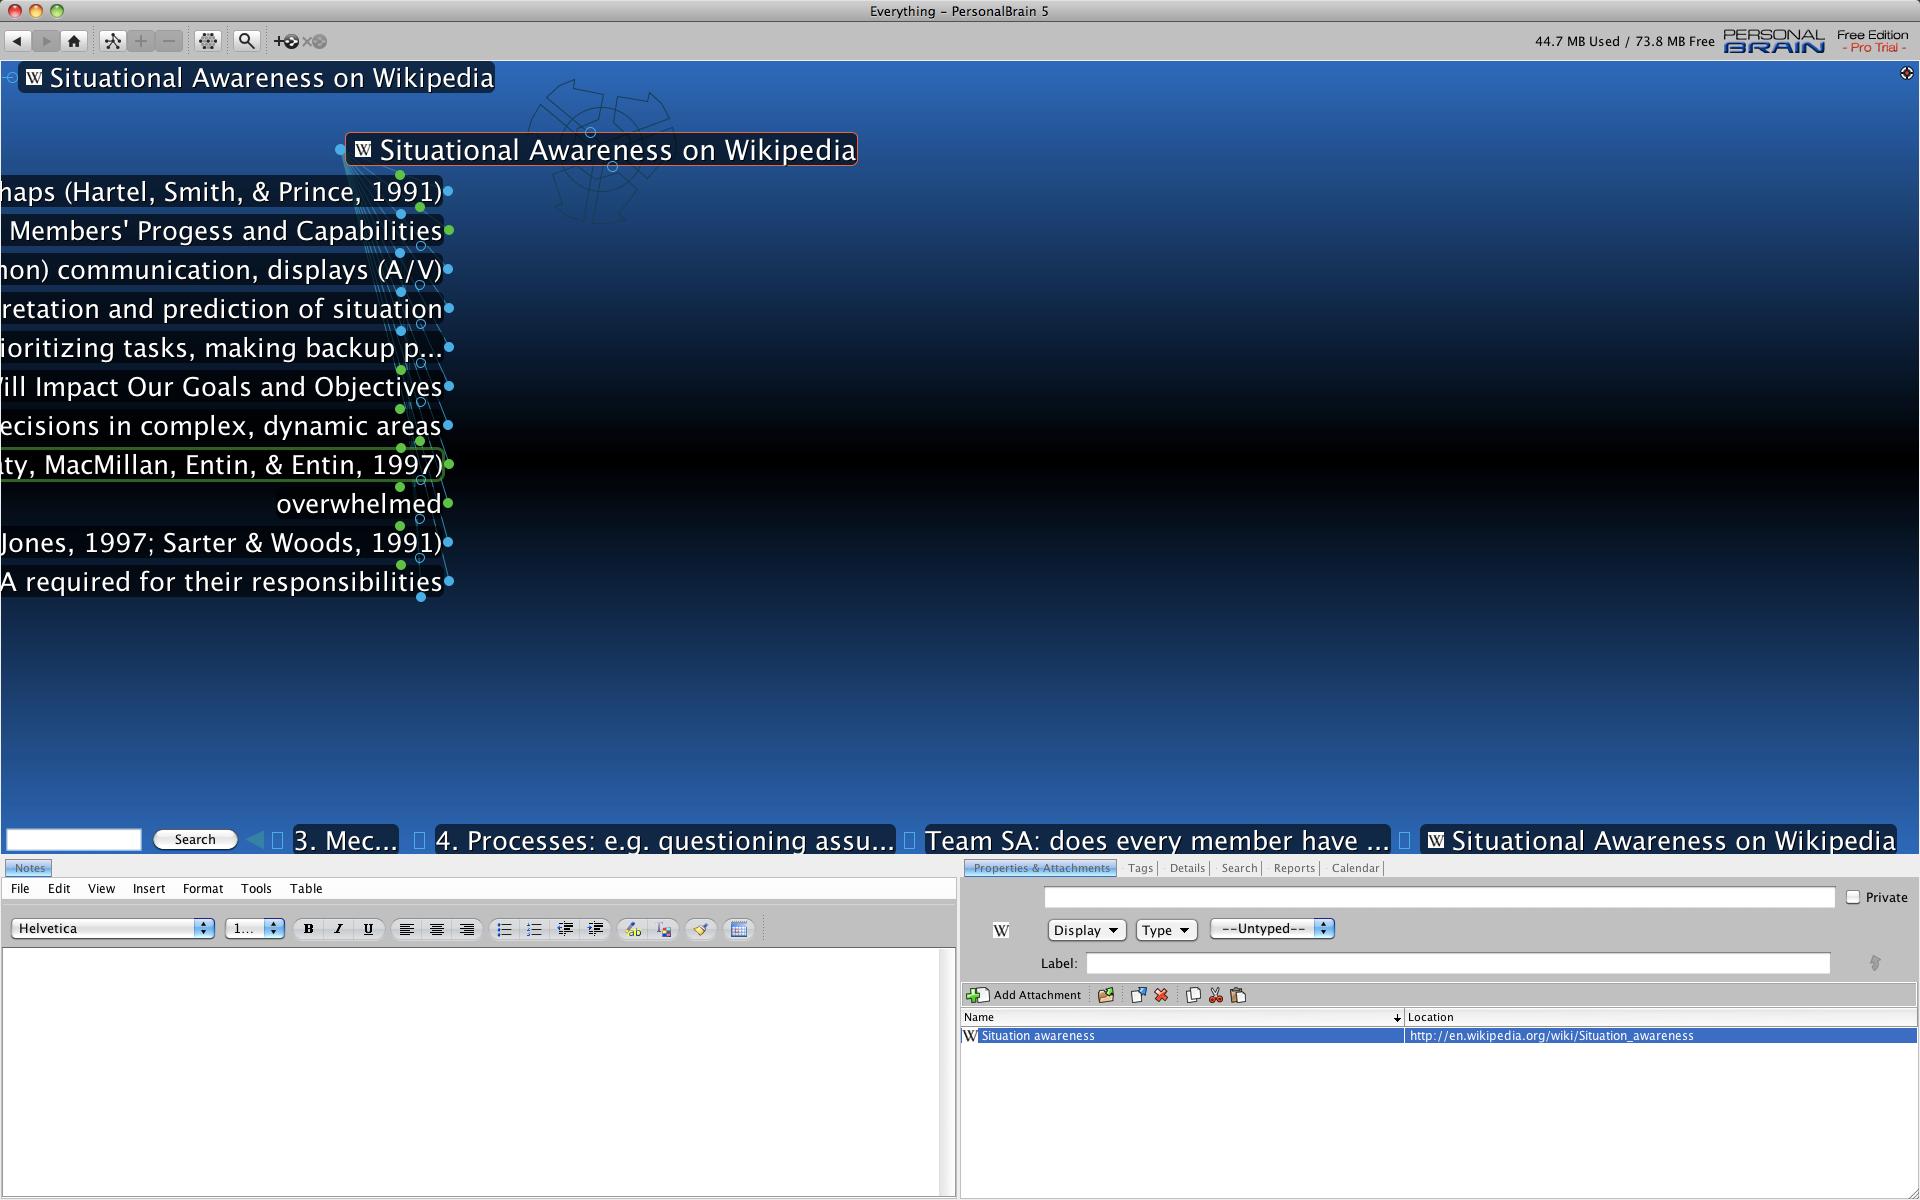 Click image for larger version - Name: Screen_shot_2009-10-18_at_October_18,_2009_4.19.58_PM_(2).png, Views: 100, Size: 245.19 KB